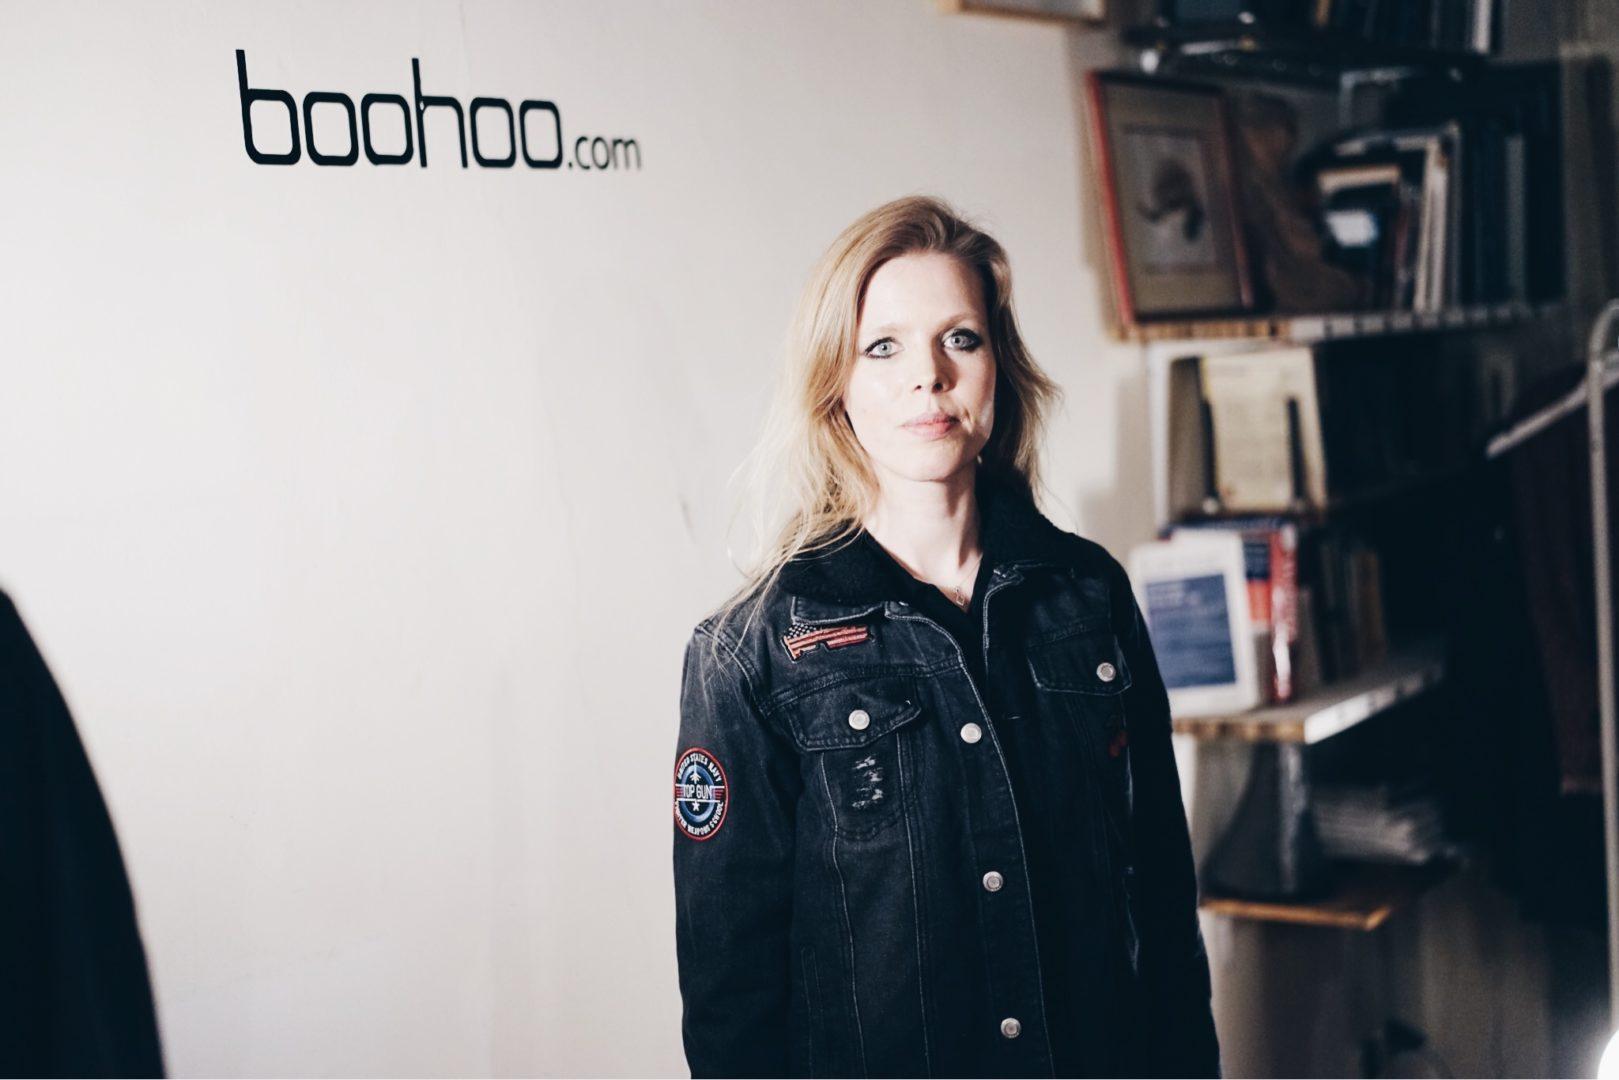 bohoo denim workshop